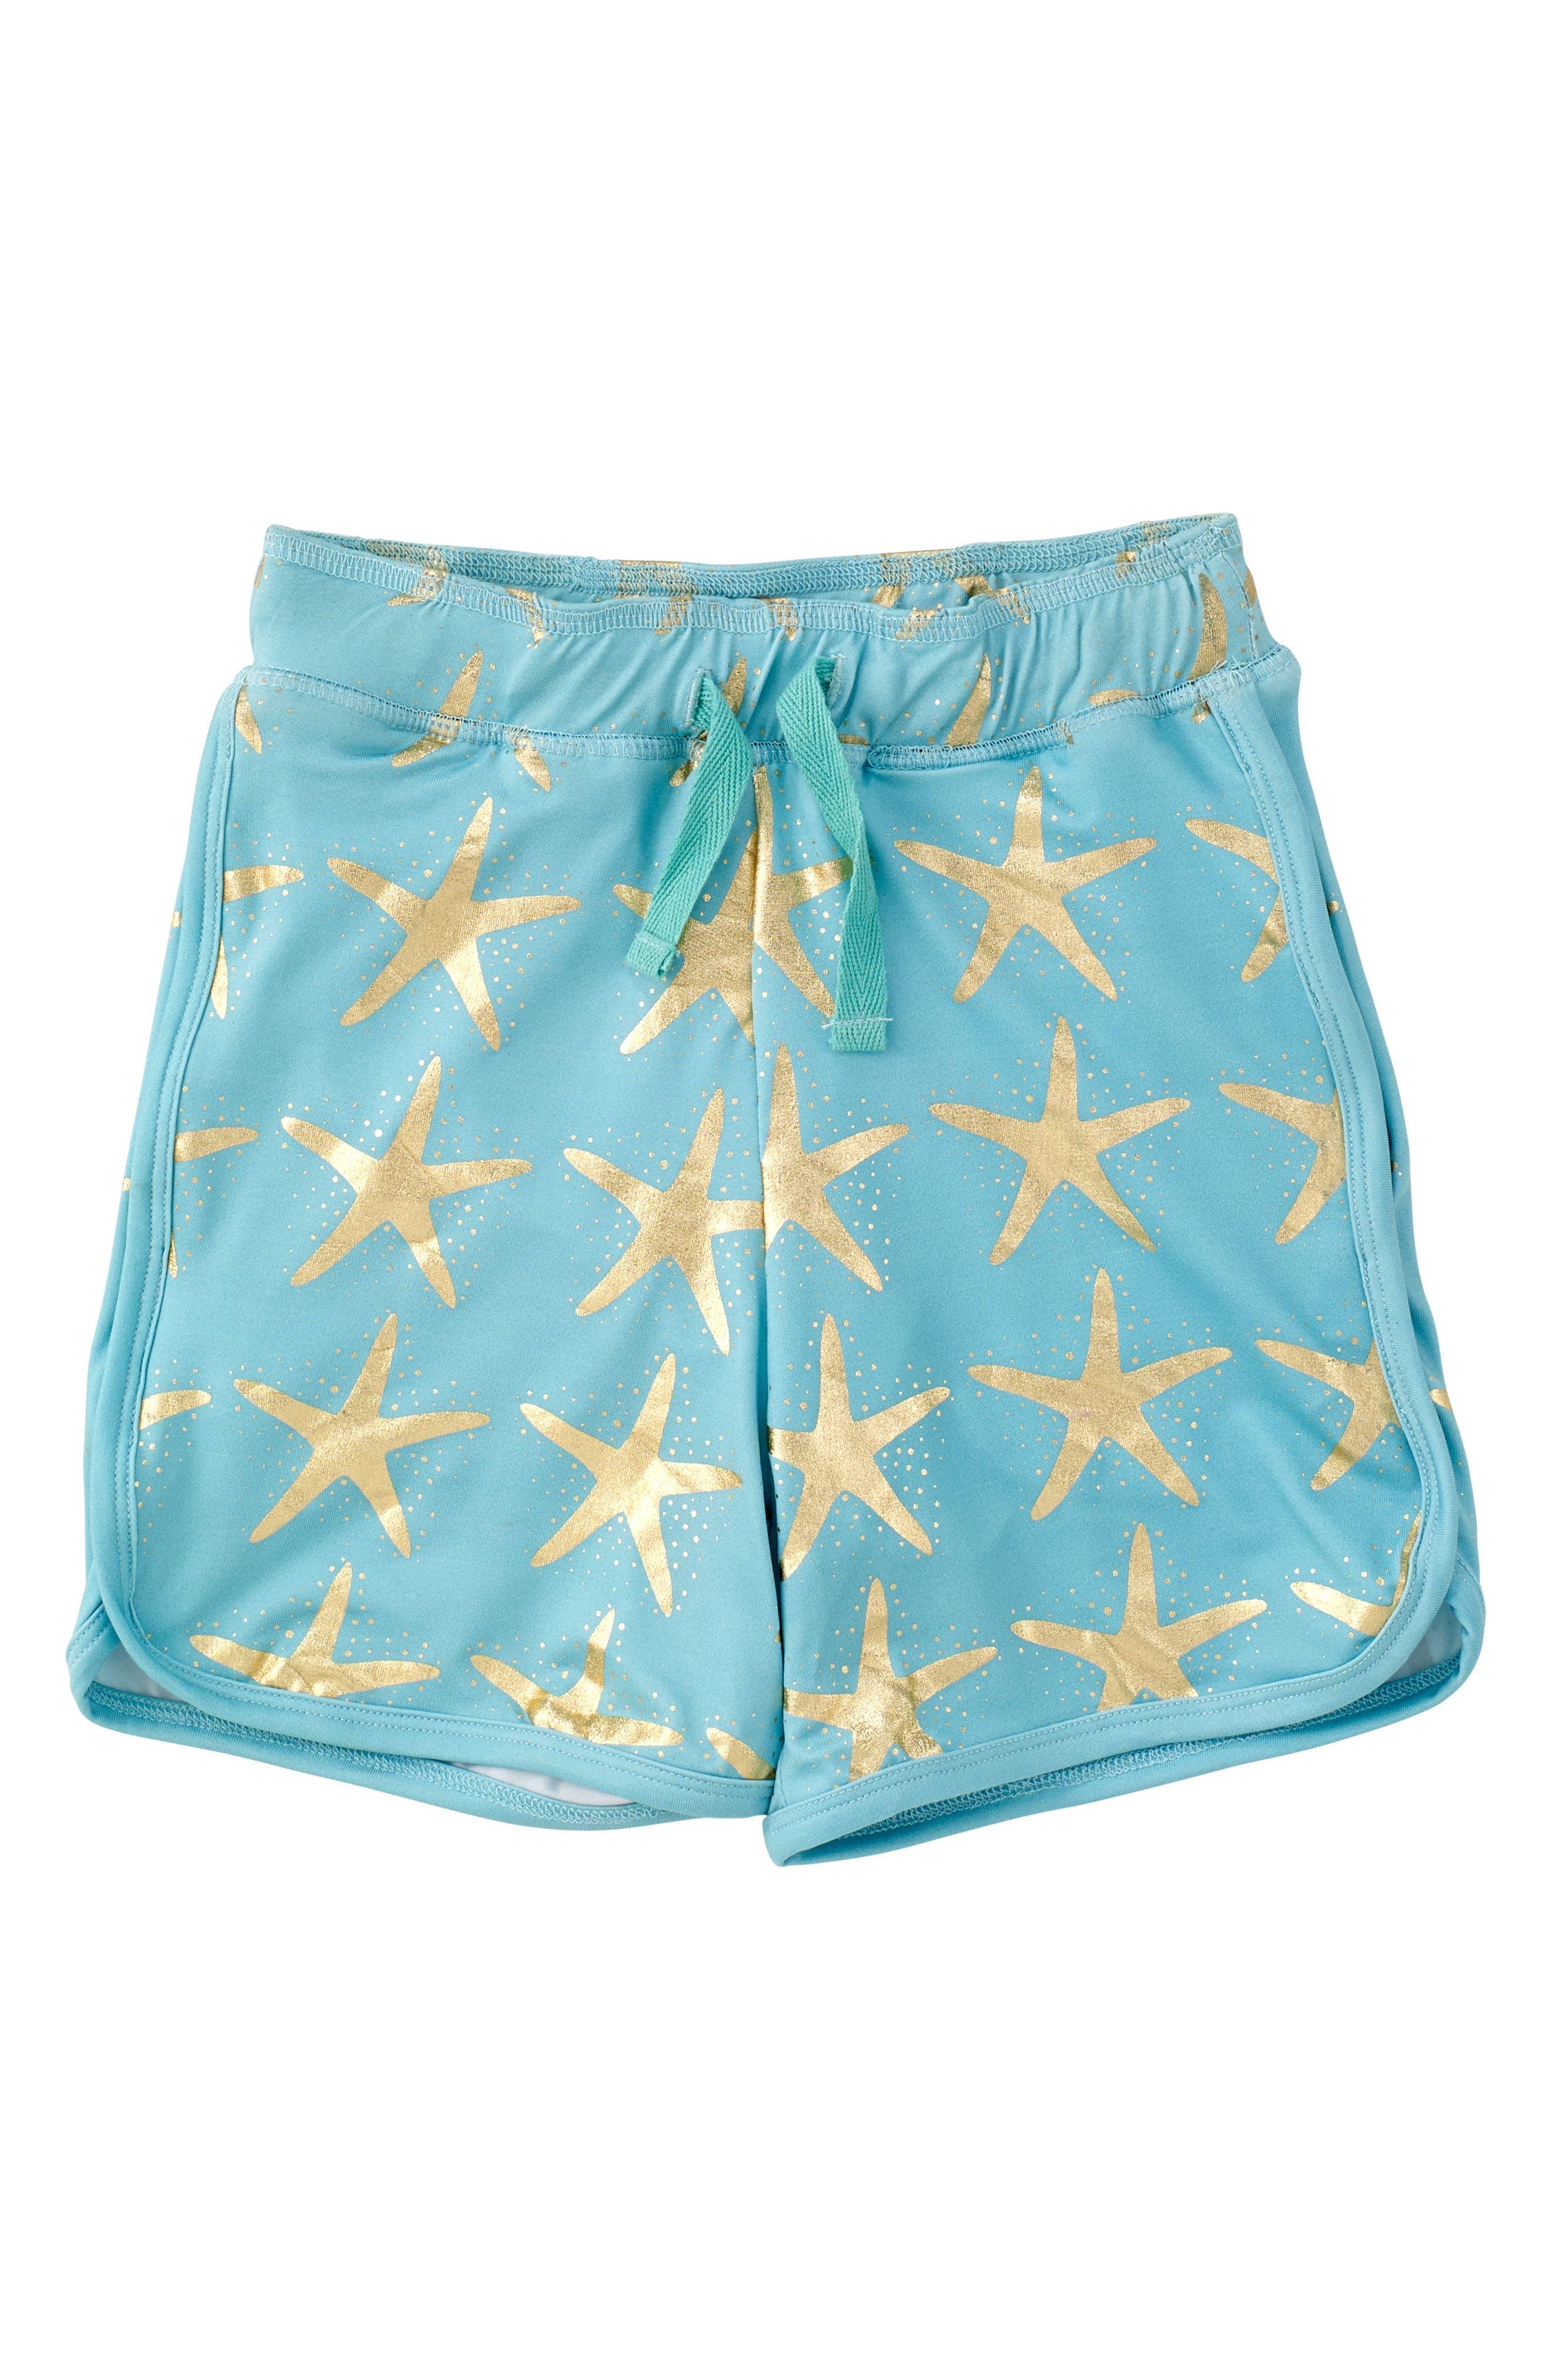 Starfish Swim Trunks,                         Main,                         color, 400